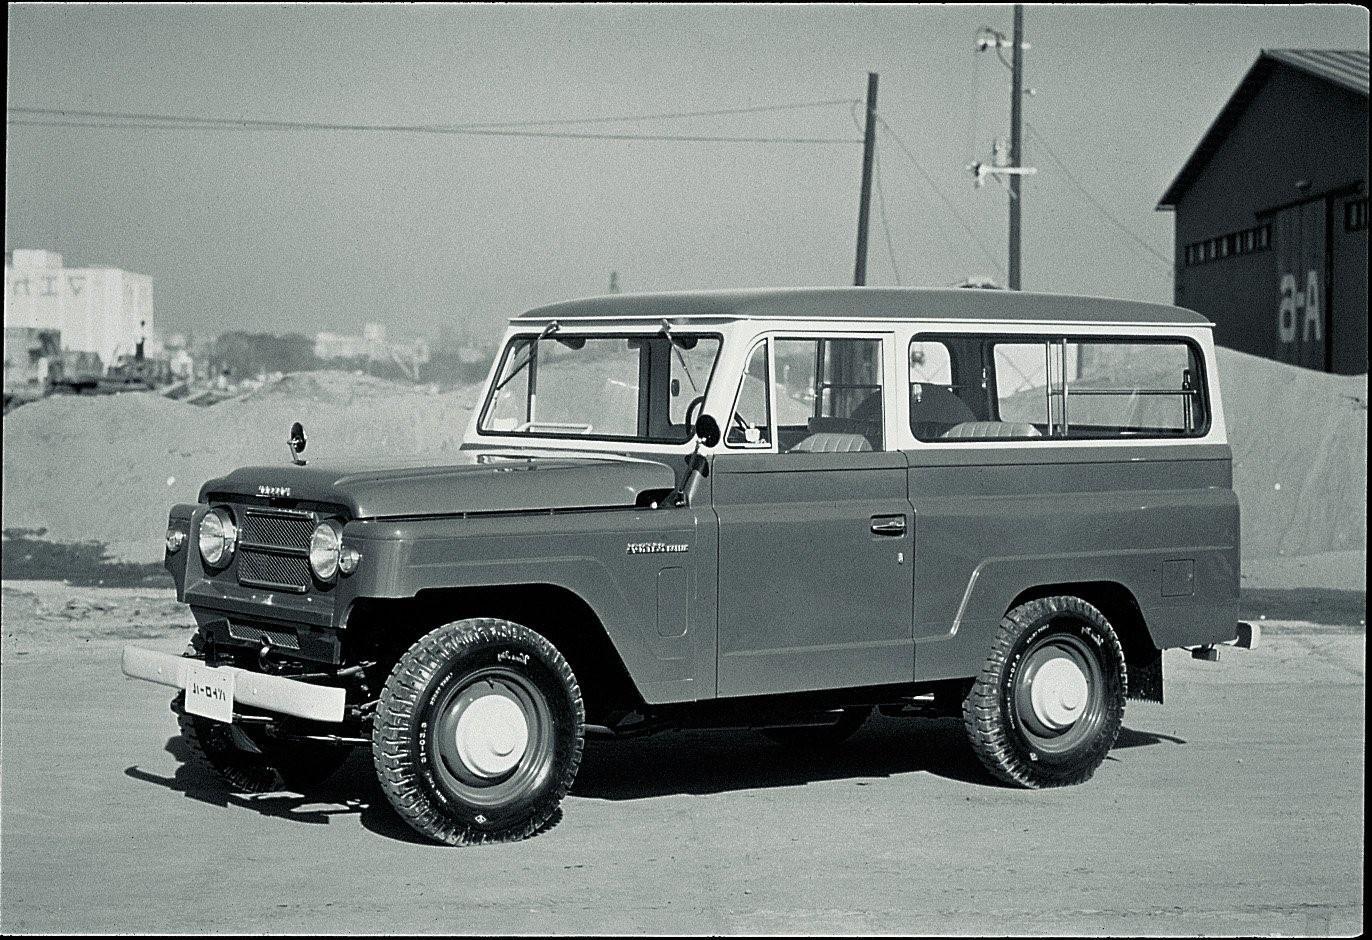 Datsun Patrol 1960 erster offizeller Patrol